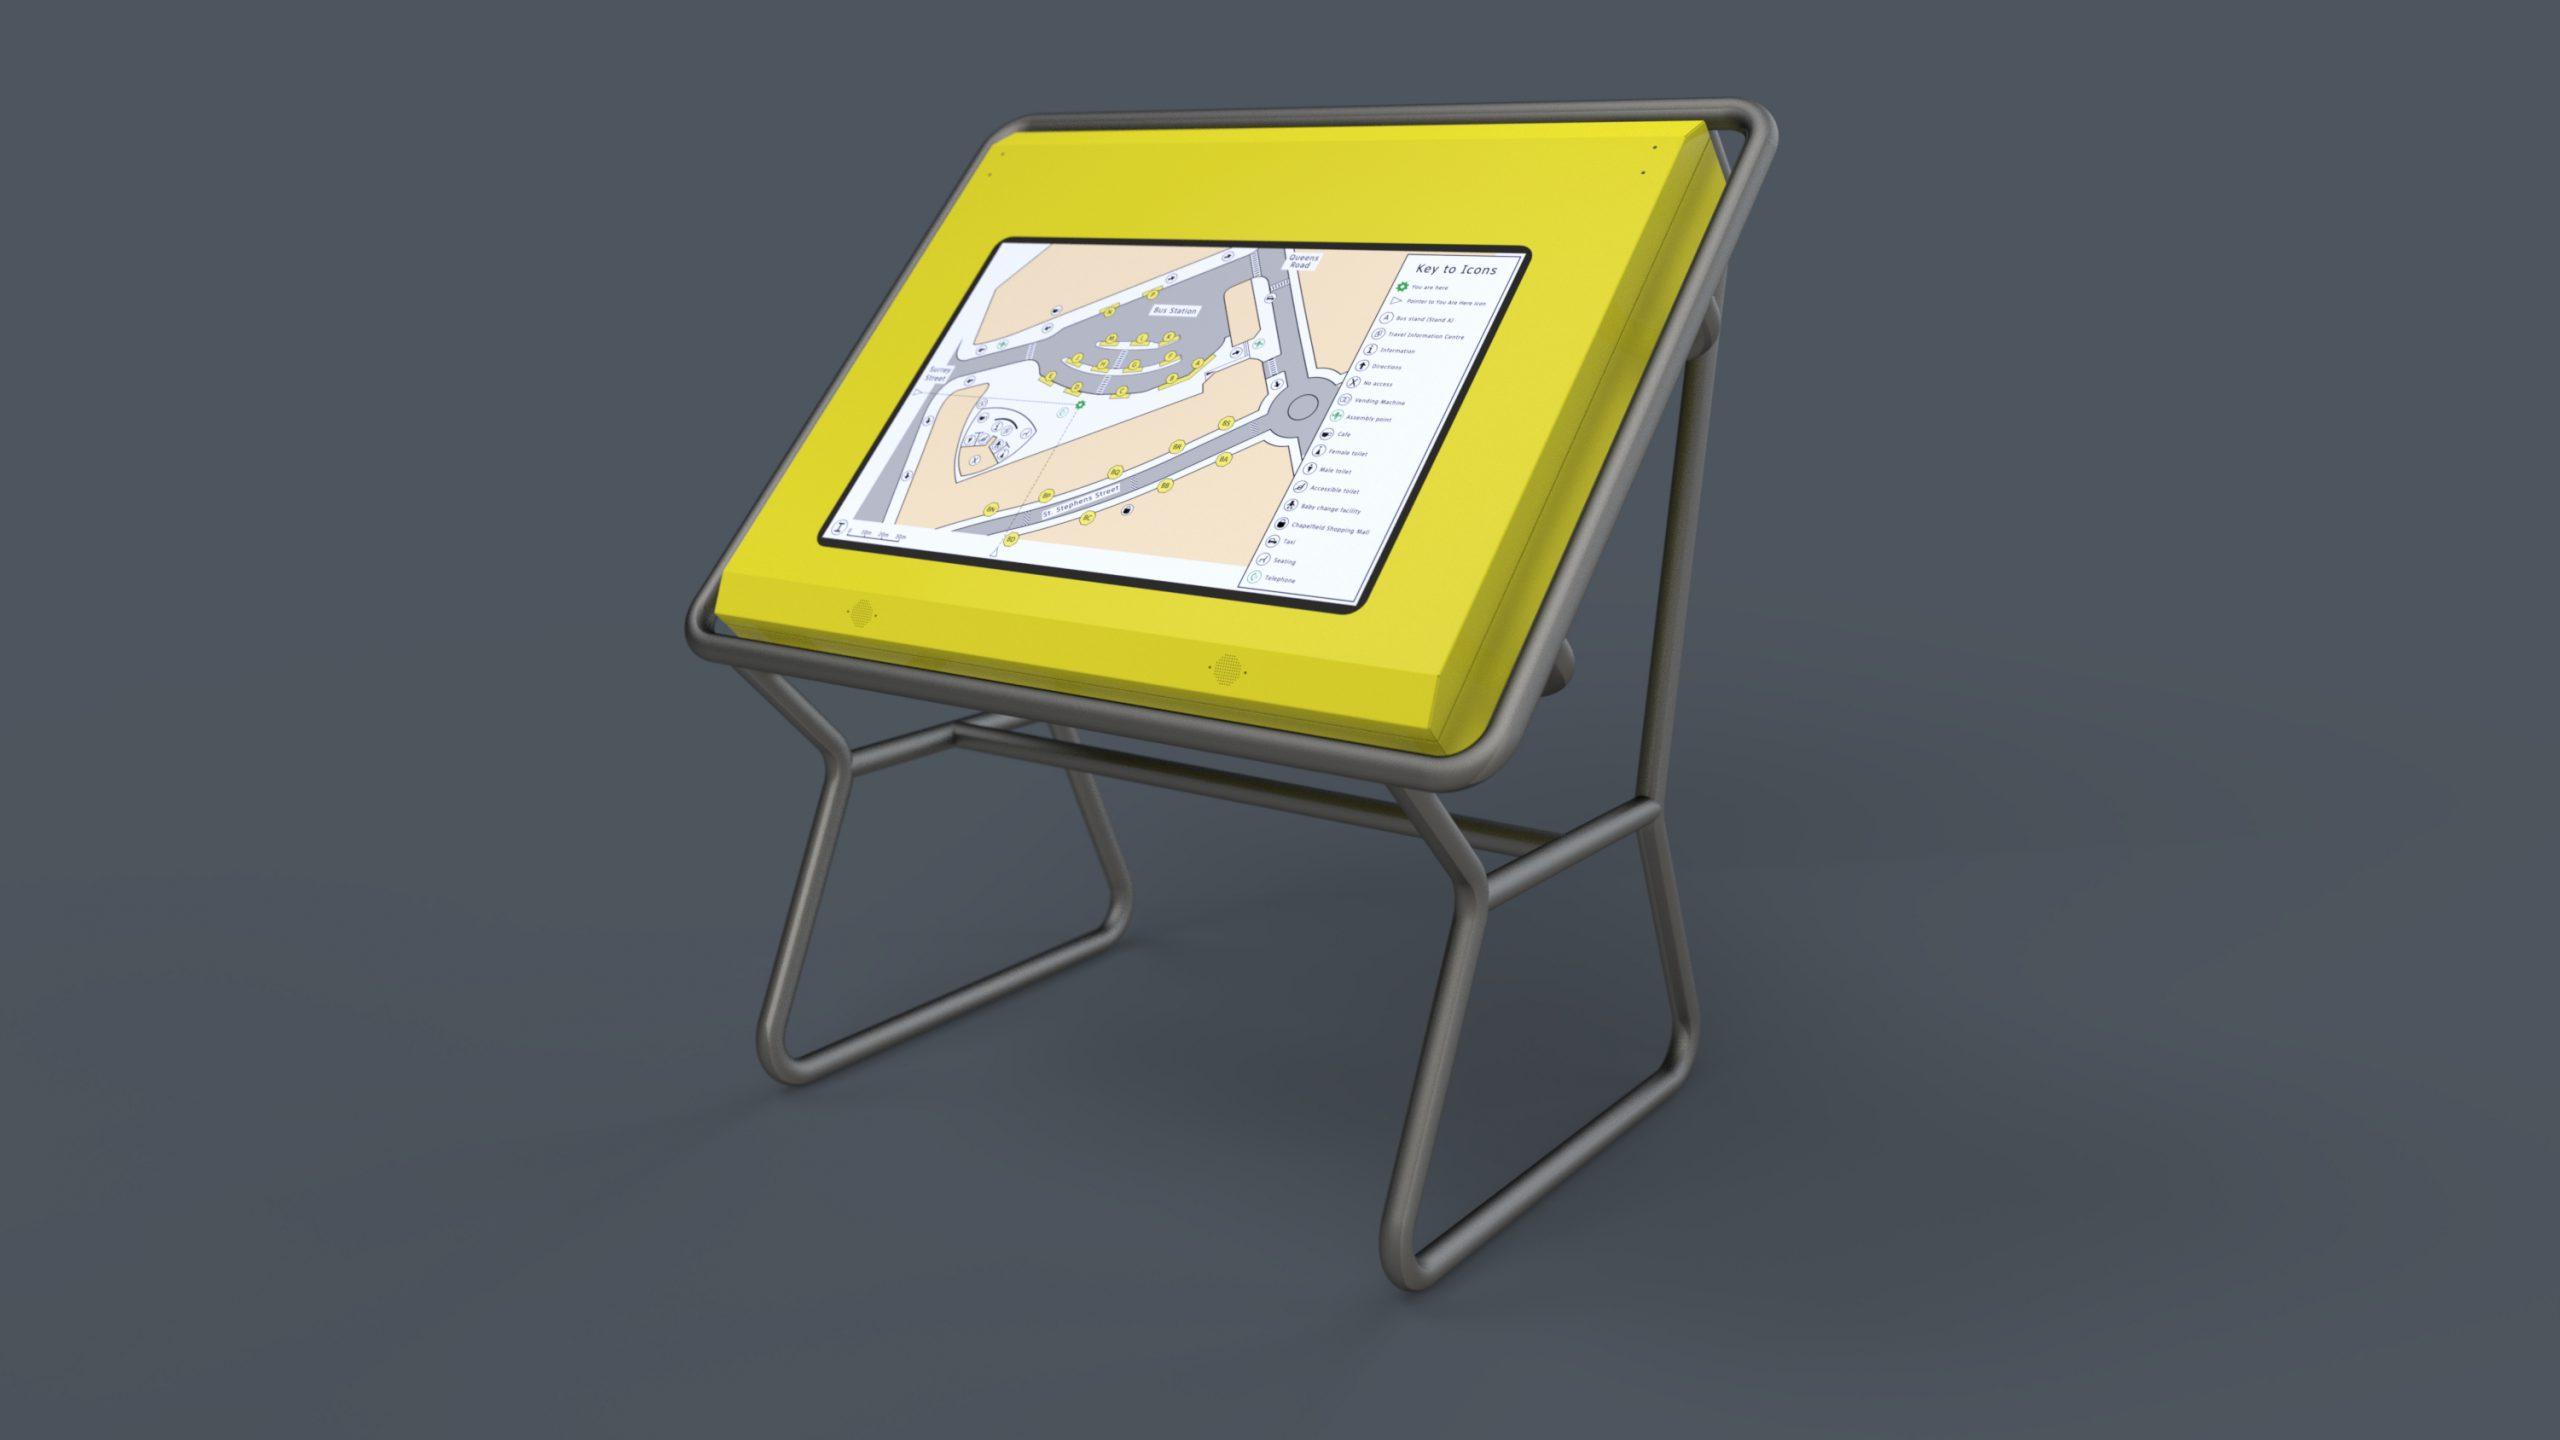 Ariadne Tactile Map placed behind Nexus Alpha bespoke wording. Concept by Nexus Alpha LPS.